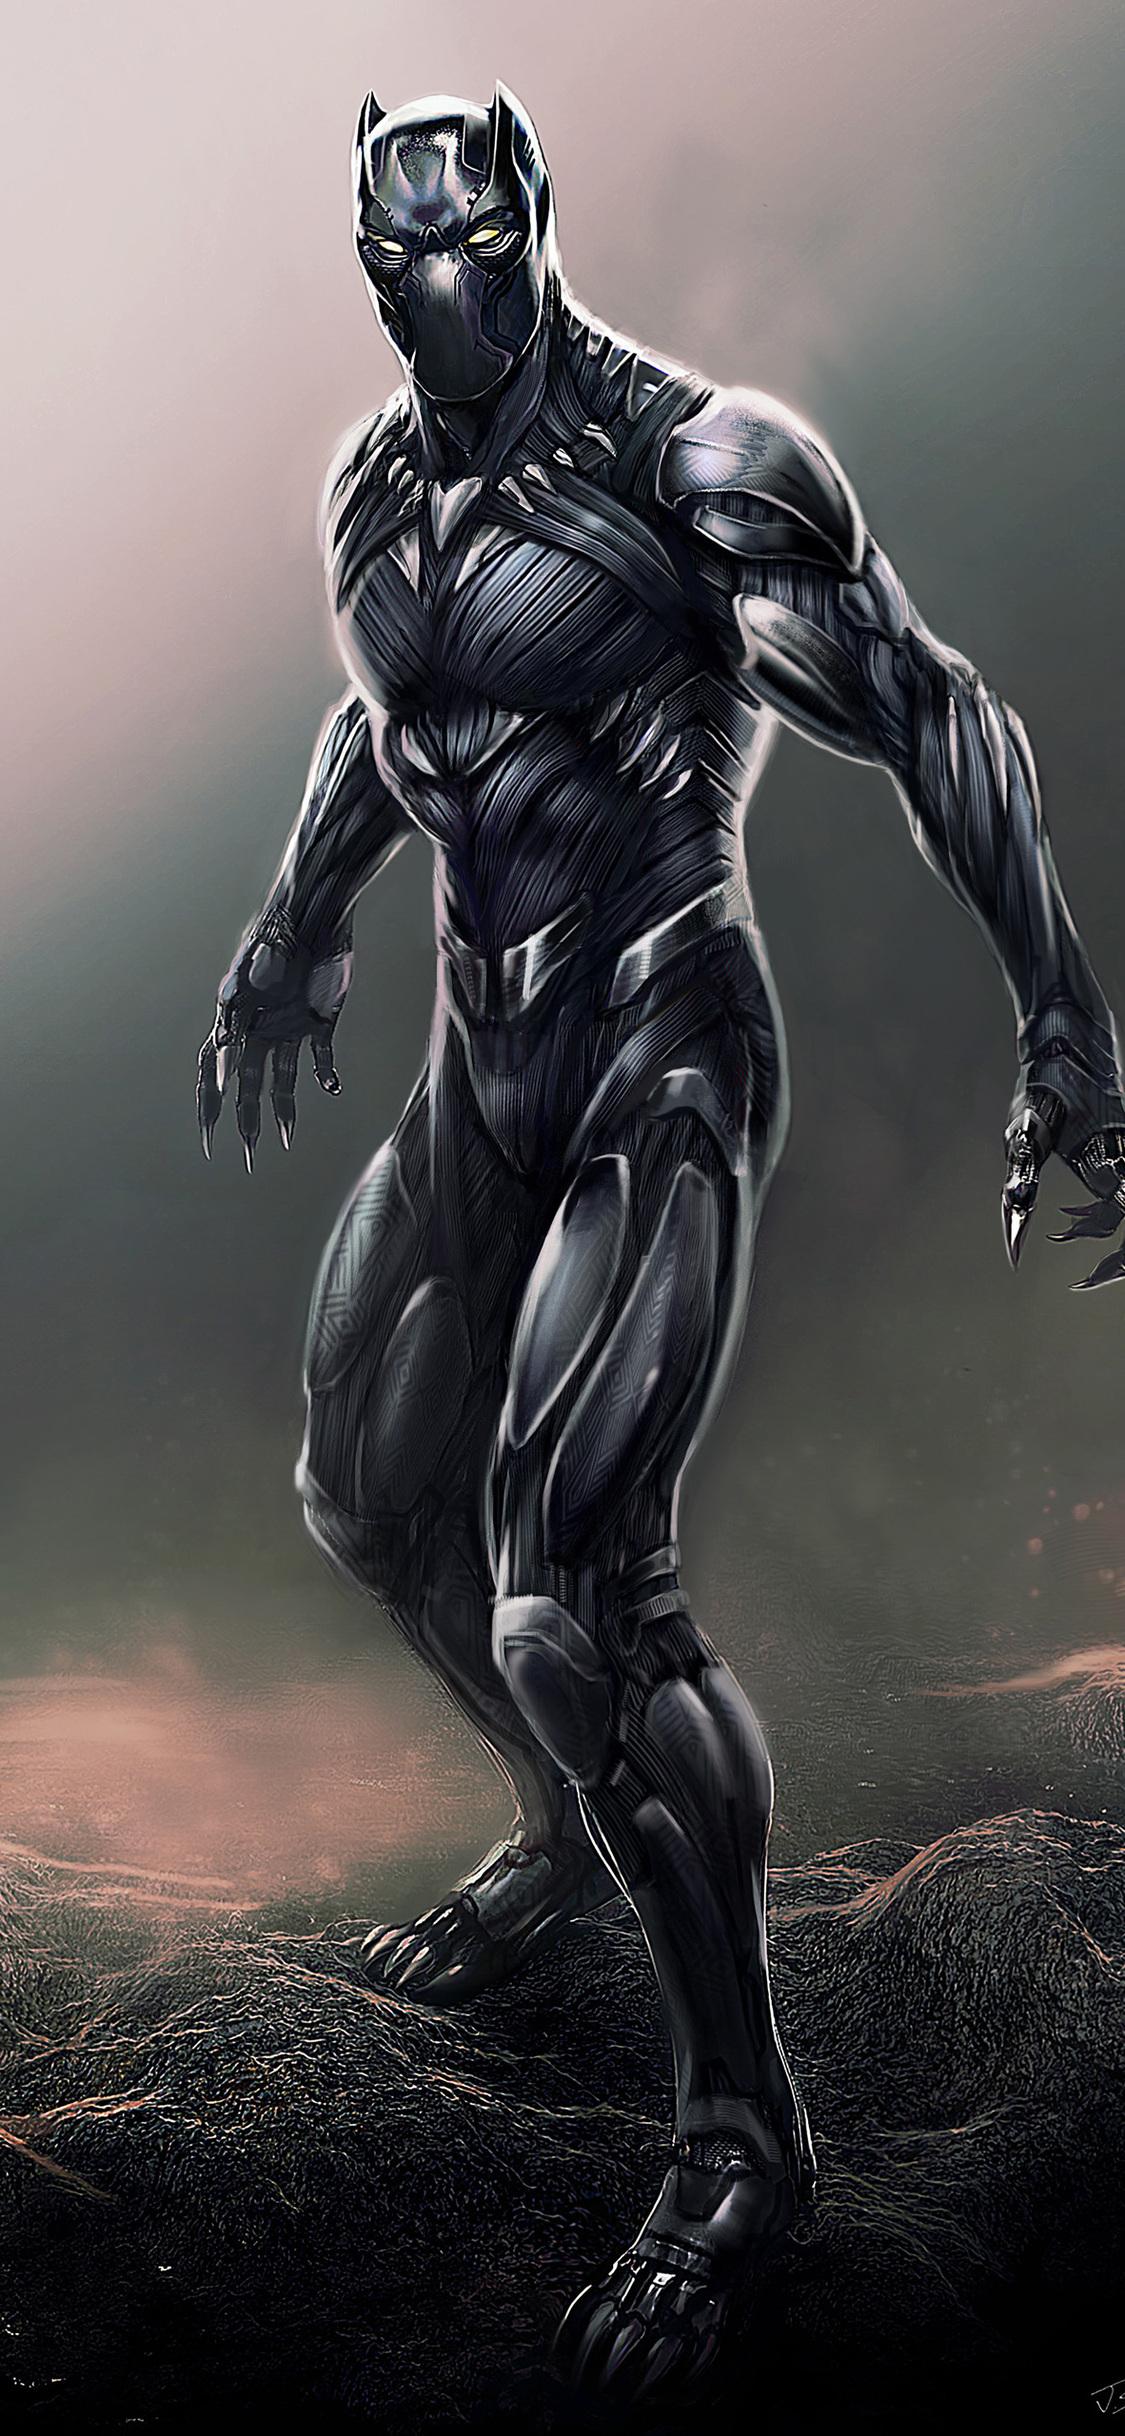 1125x2436 Black Panther Digital Artwork Iphone XS,Iphone ...